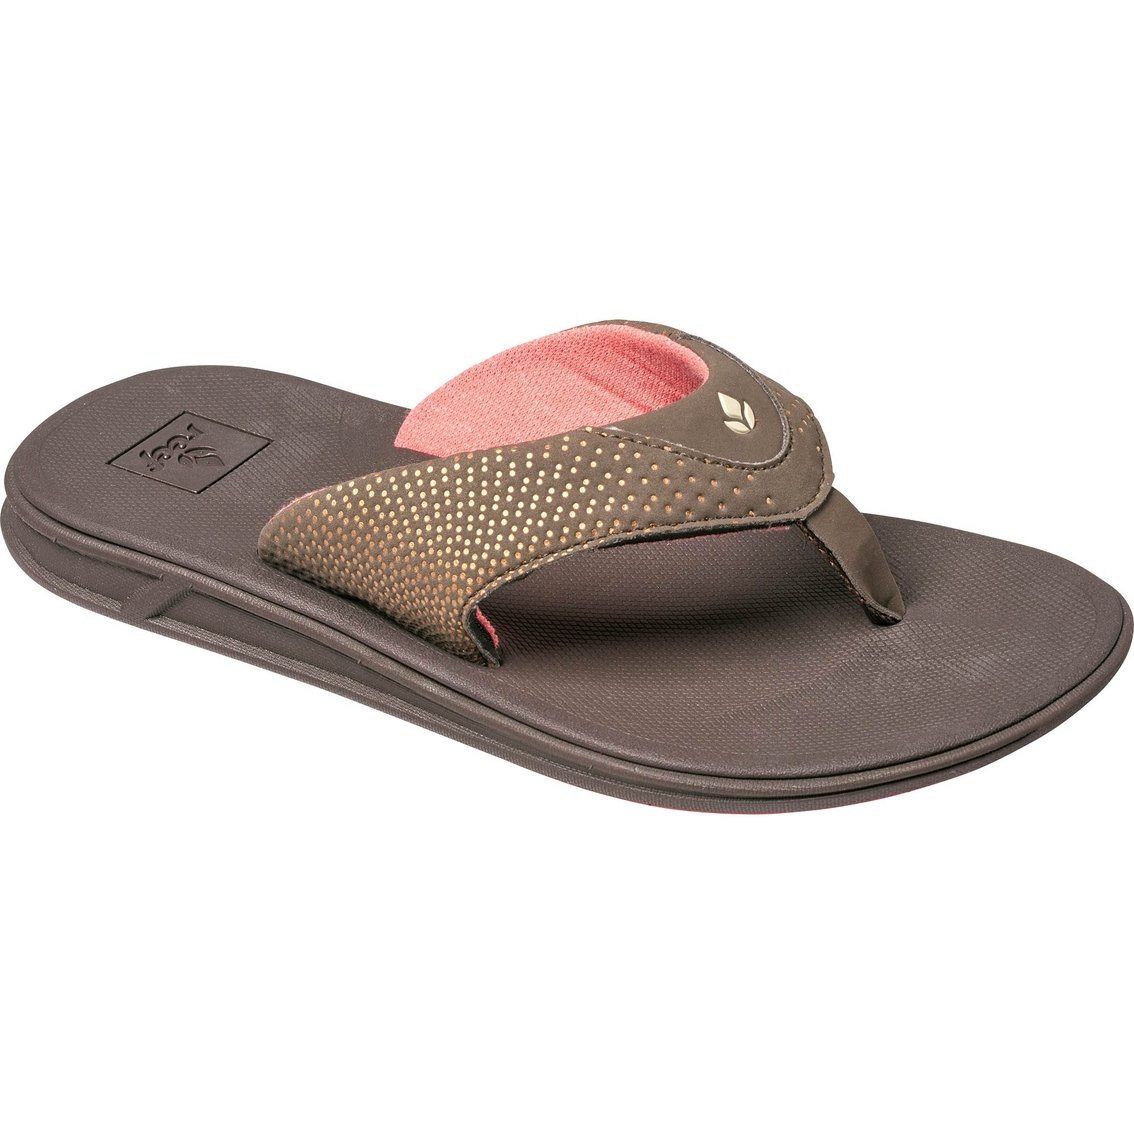 d4128edd51a1 Reef Rover Women s Faux Leather Nubuck Sandal